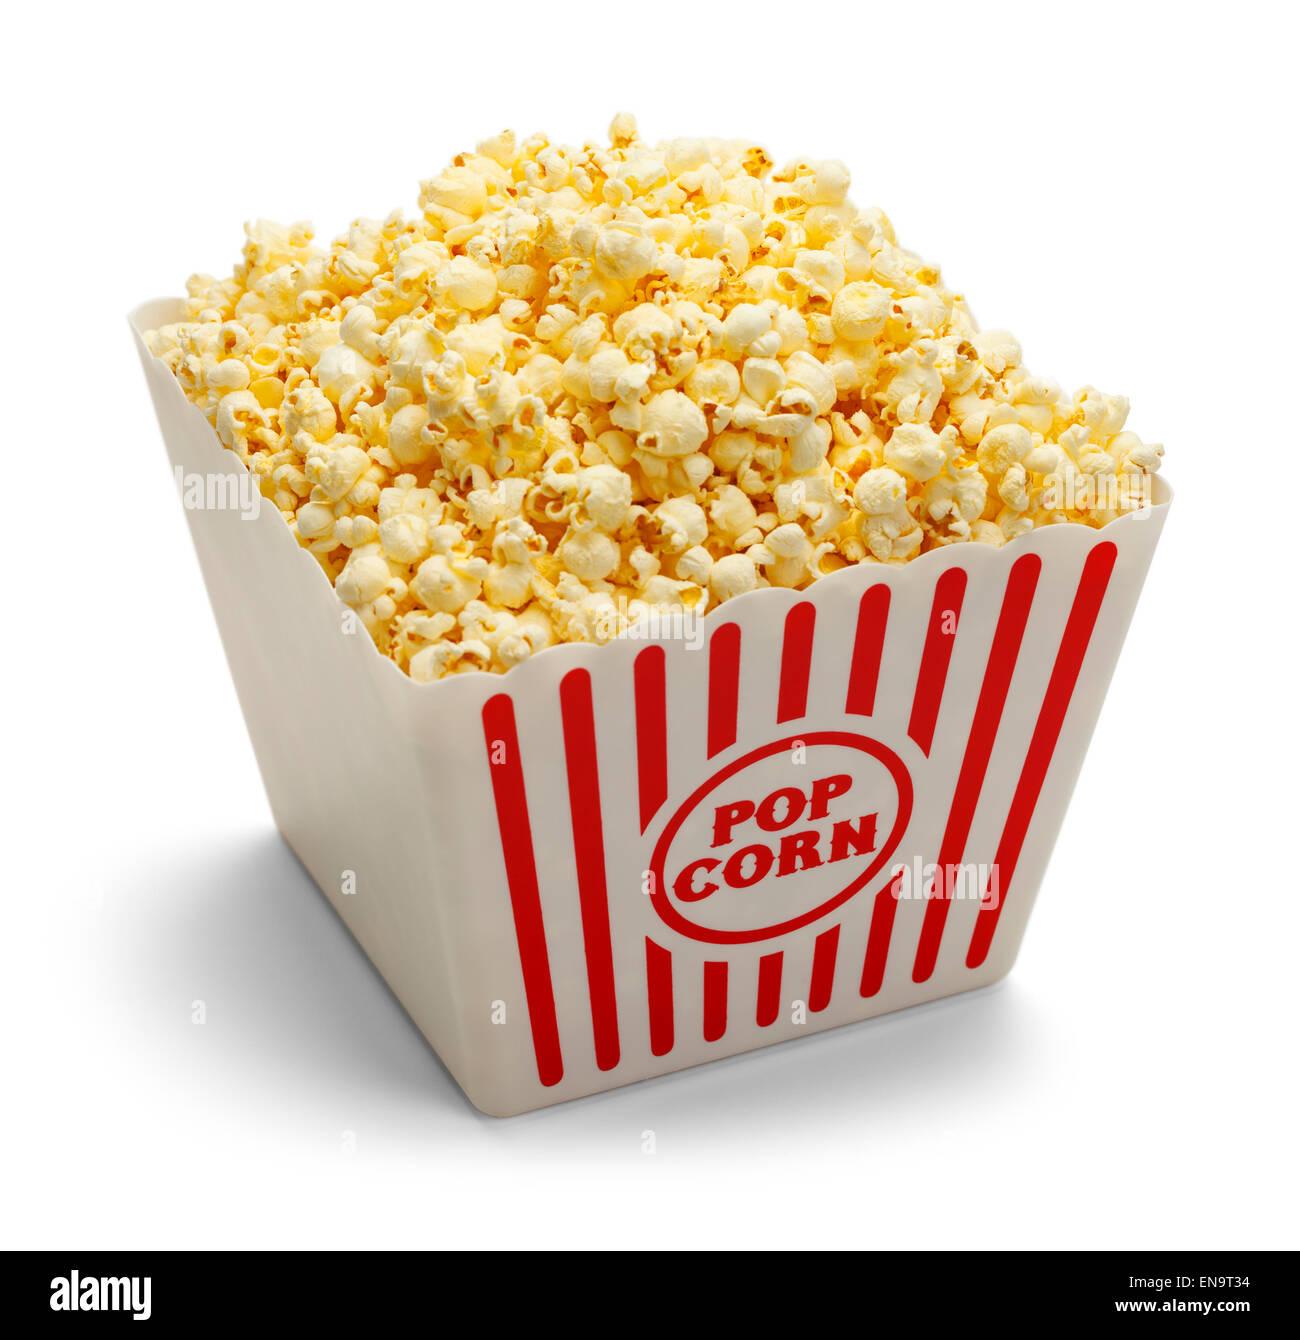 Large Tub of Butter Popcorn Isolated on White Background. - Stock Image